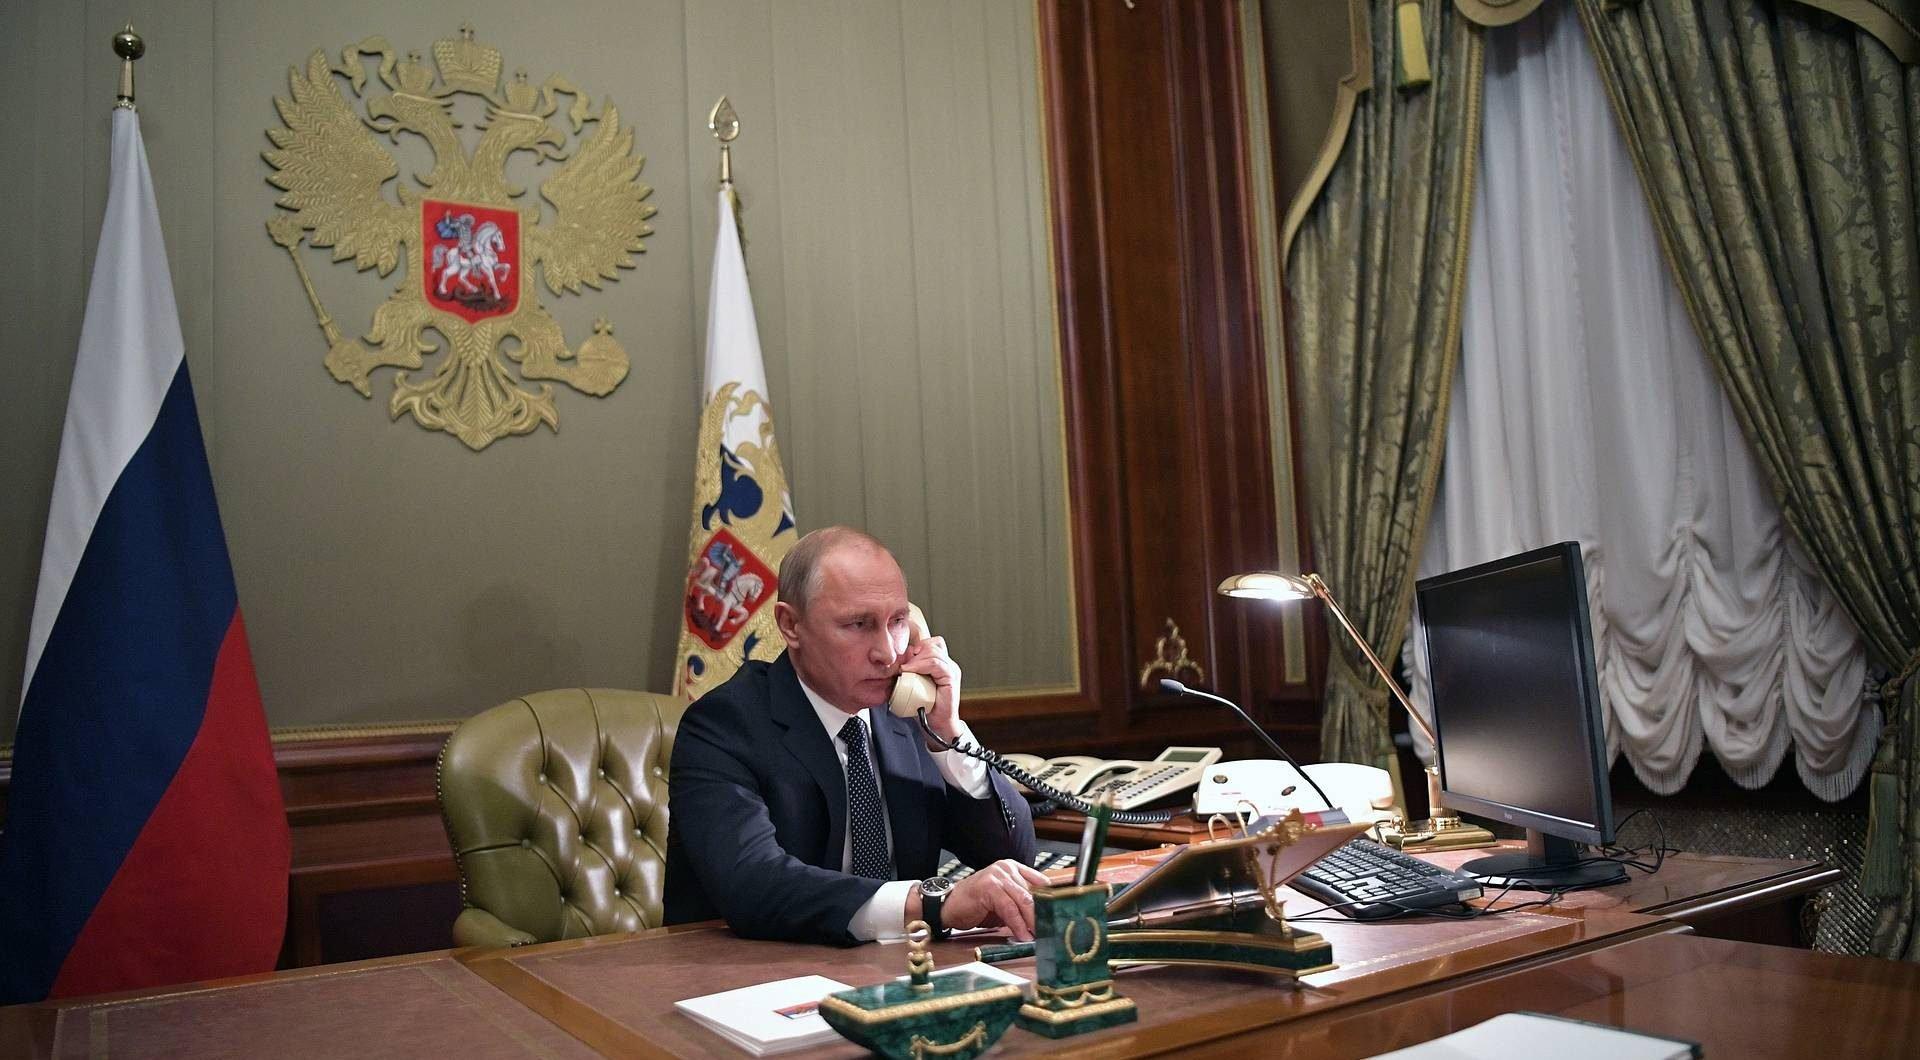 Putin had a telephone conversation with Lukashenko